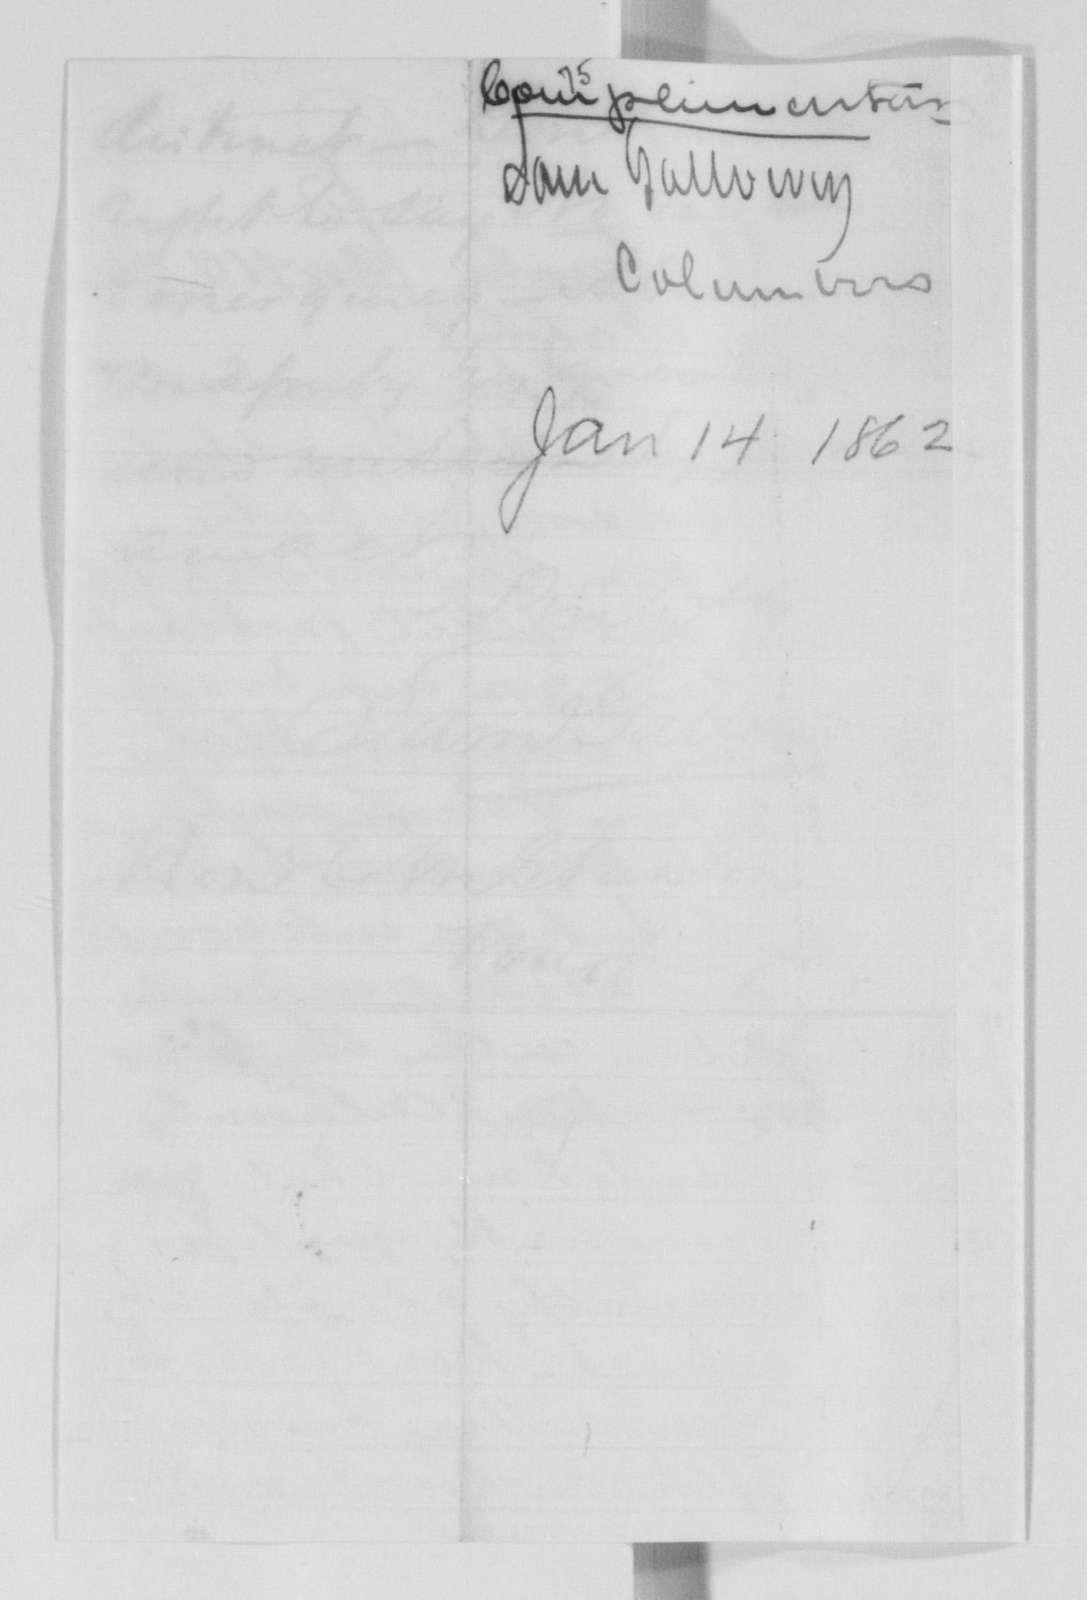 Edwin McMasters Stanton Papers: Correspondence, 1831-1870; 1862; 1862, Jan. 14-Feb. 2